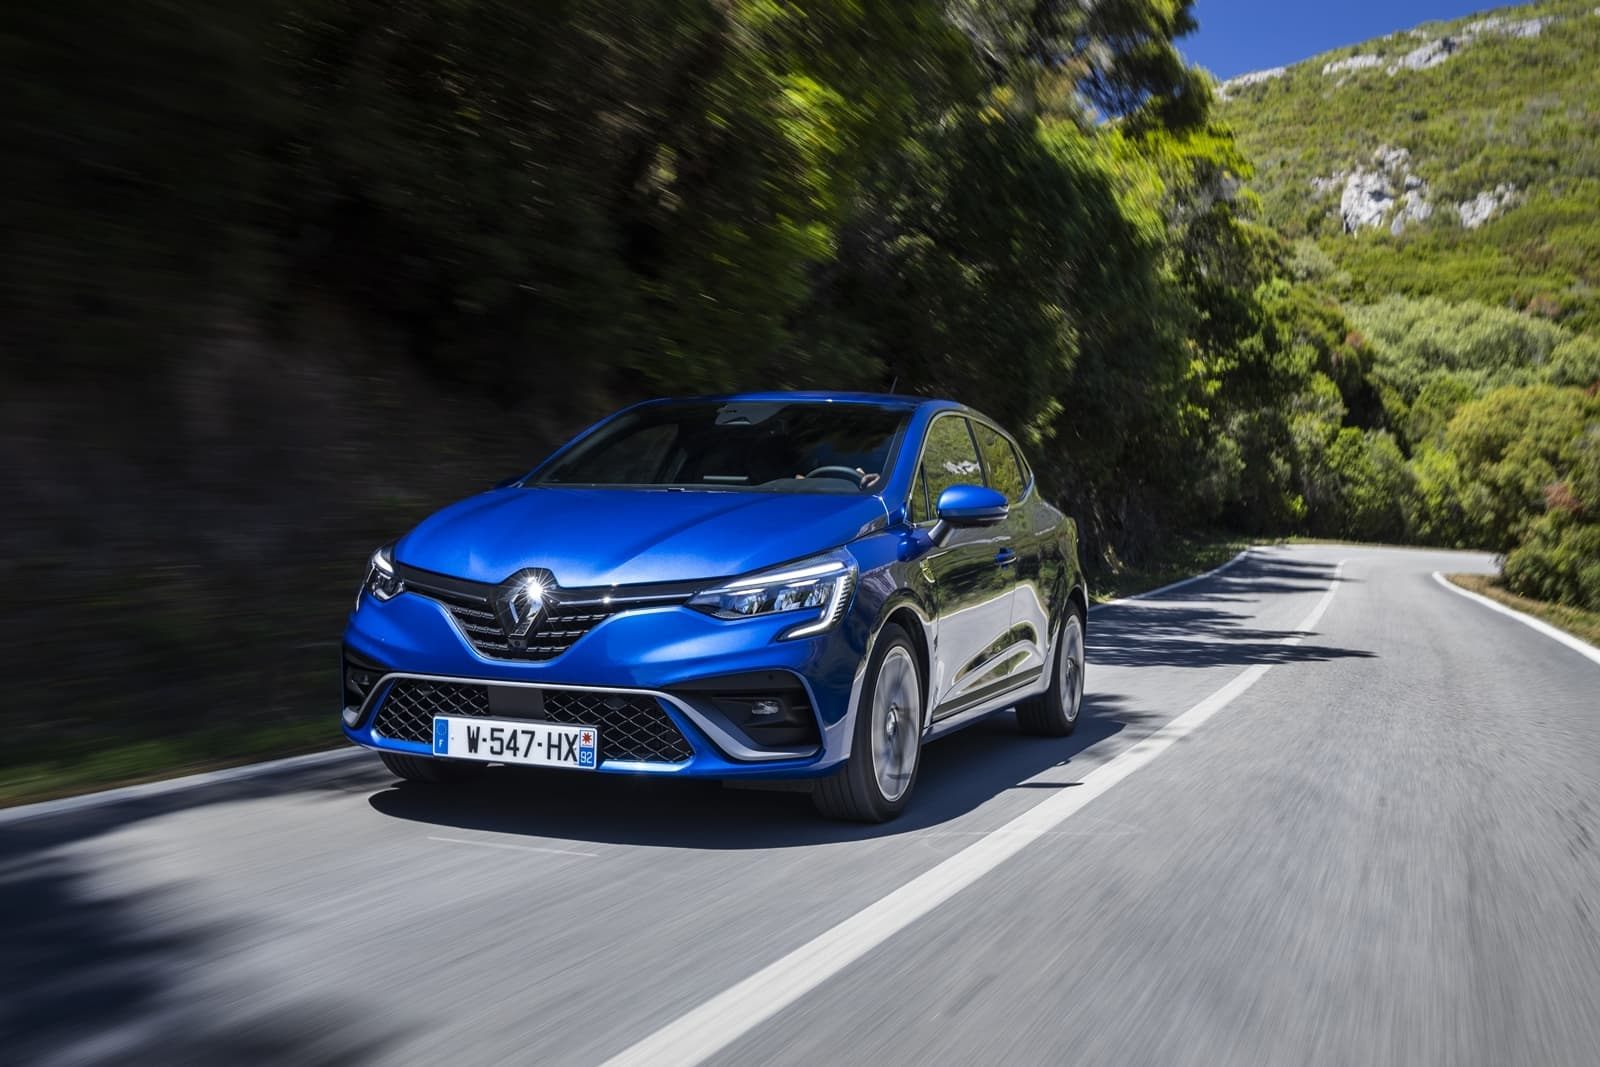 Renault Clio 2020 Prueba 0619 025